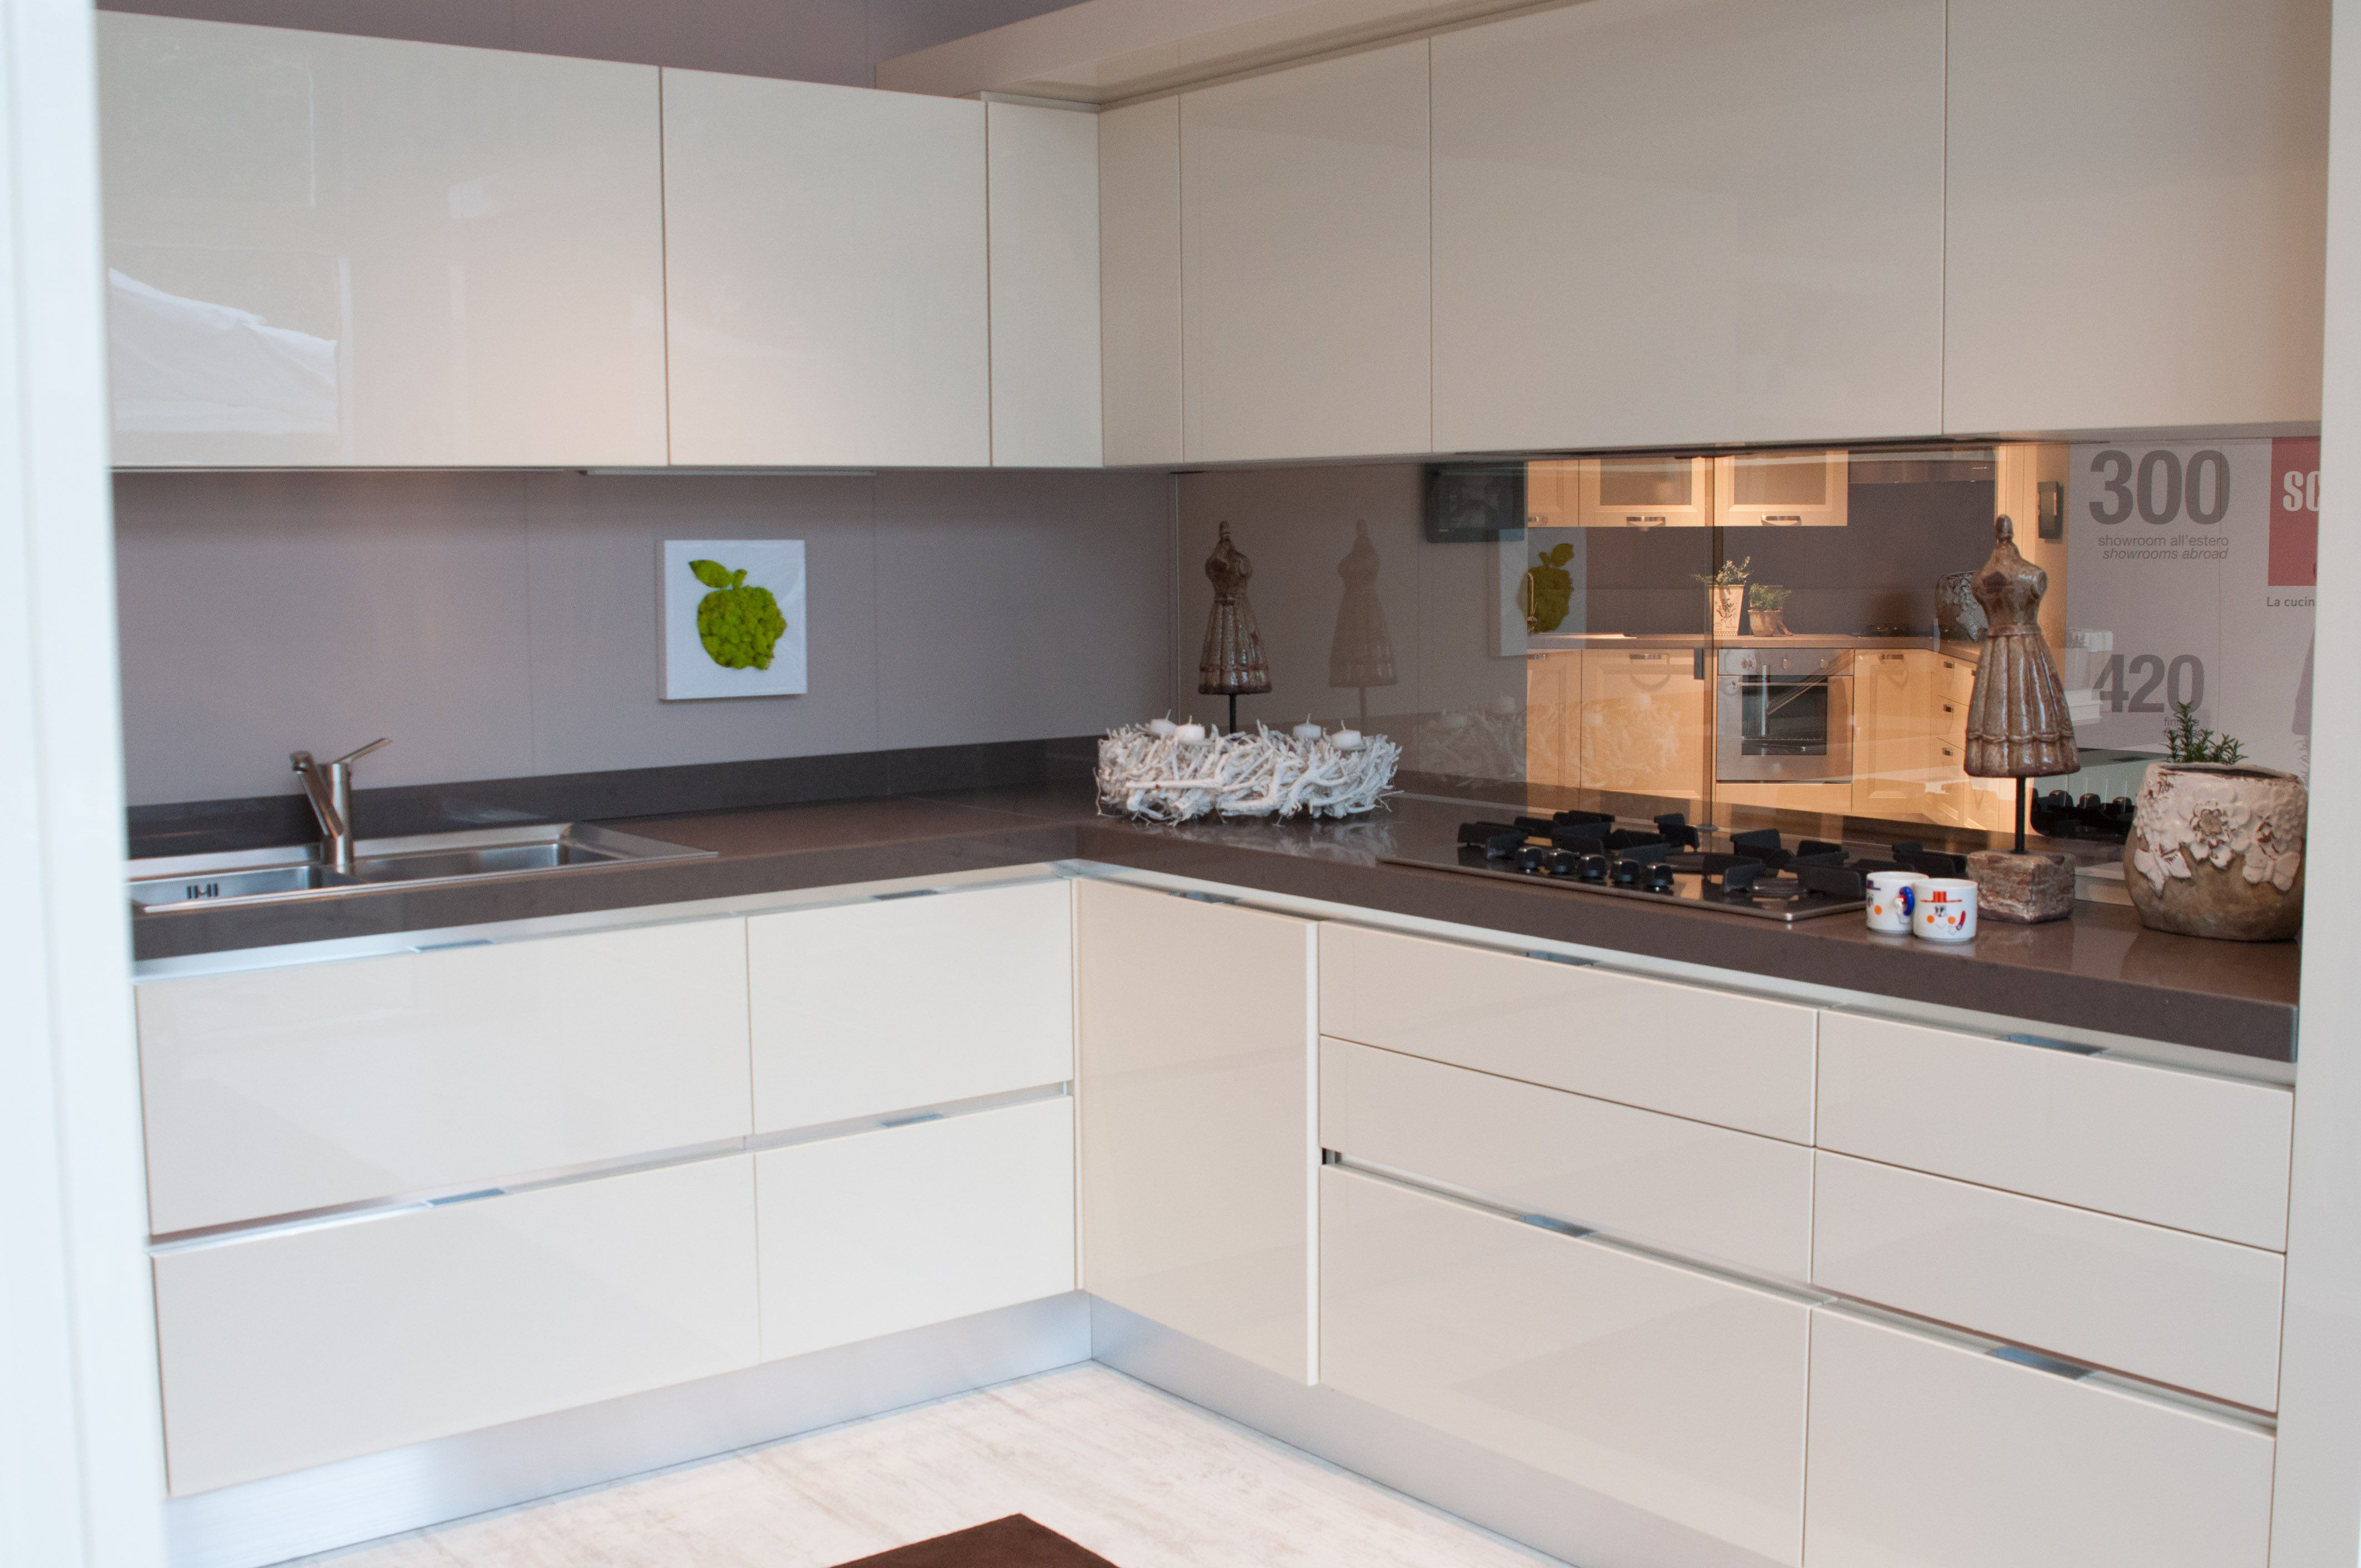 Cucina moderna scavolini composizione ad angolo bianca home pinterest apartment ideas - Cucina scavolini evolution bianca ...